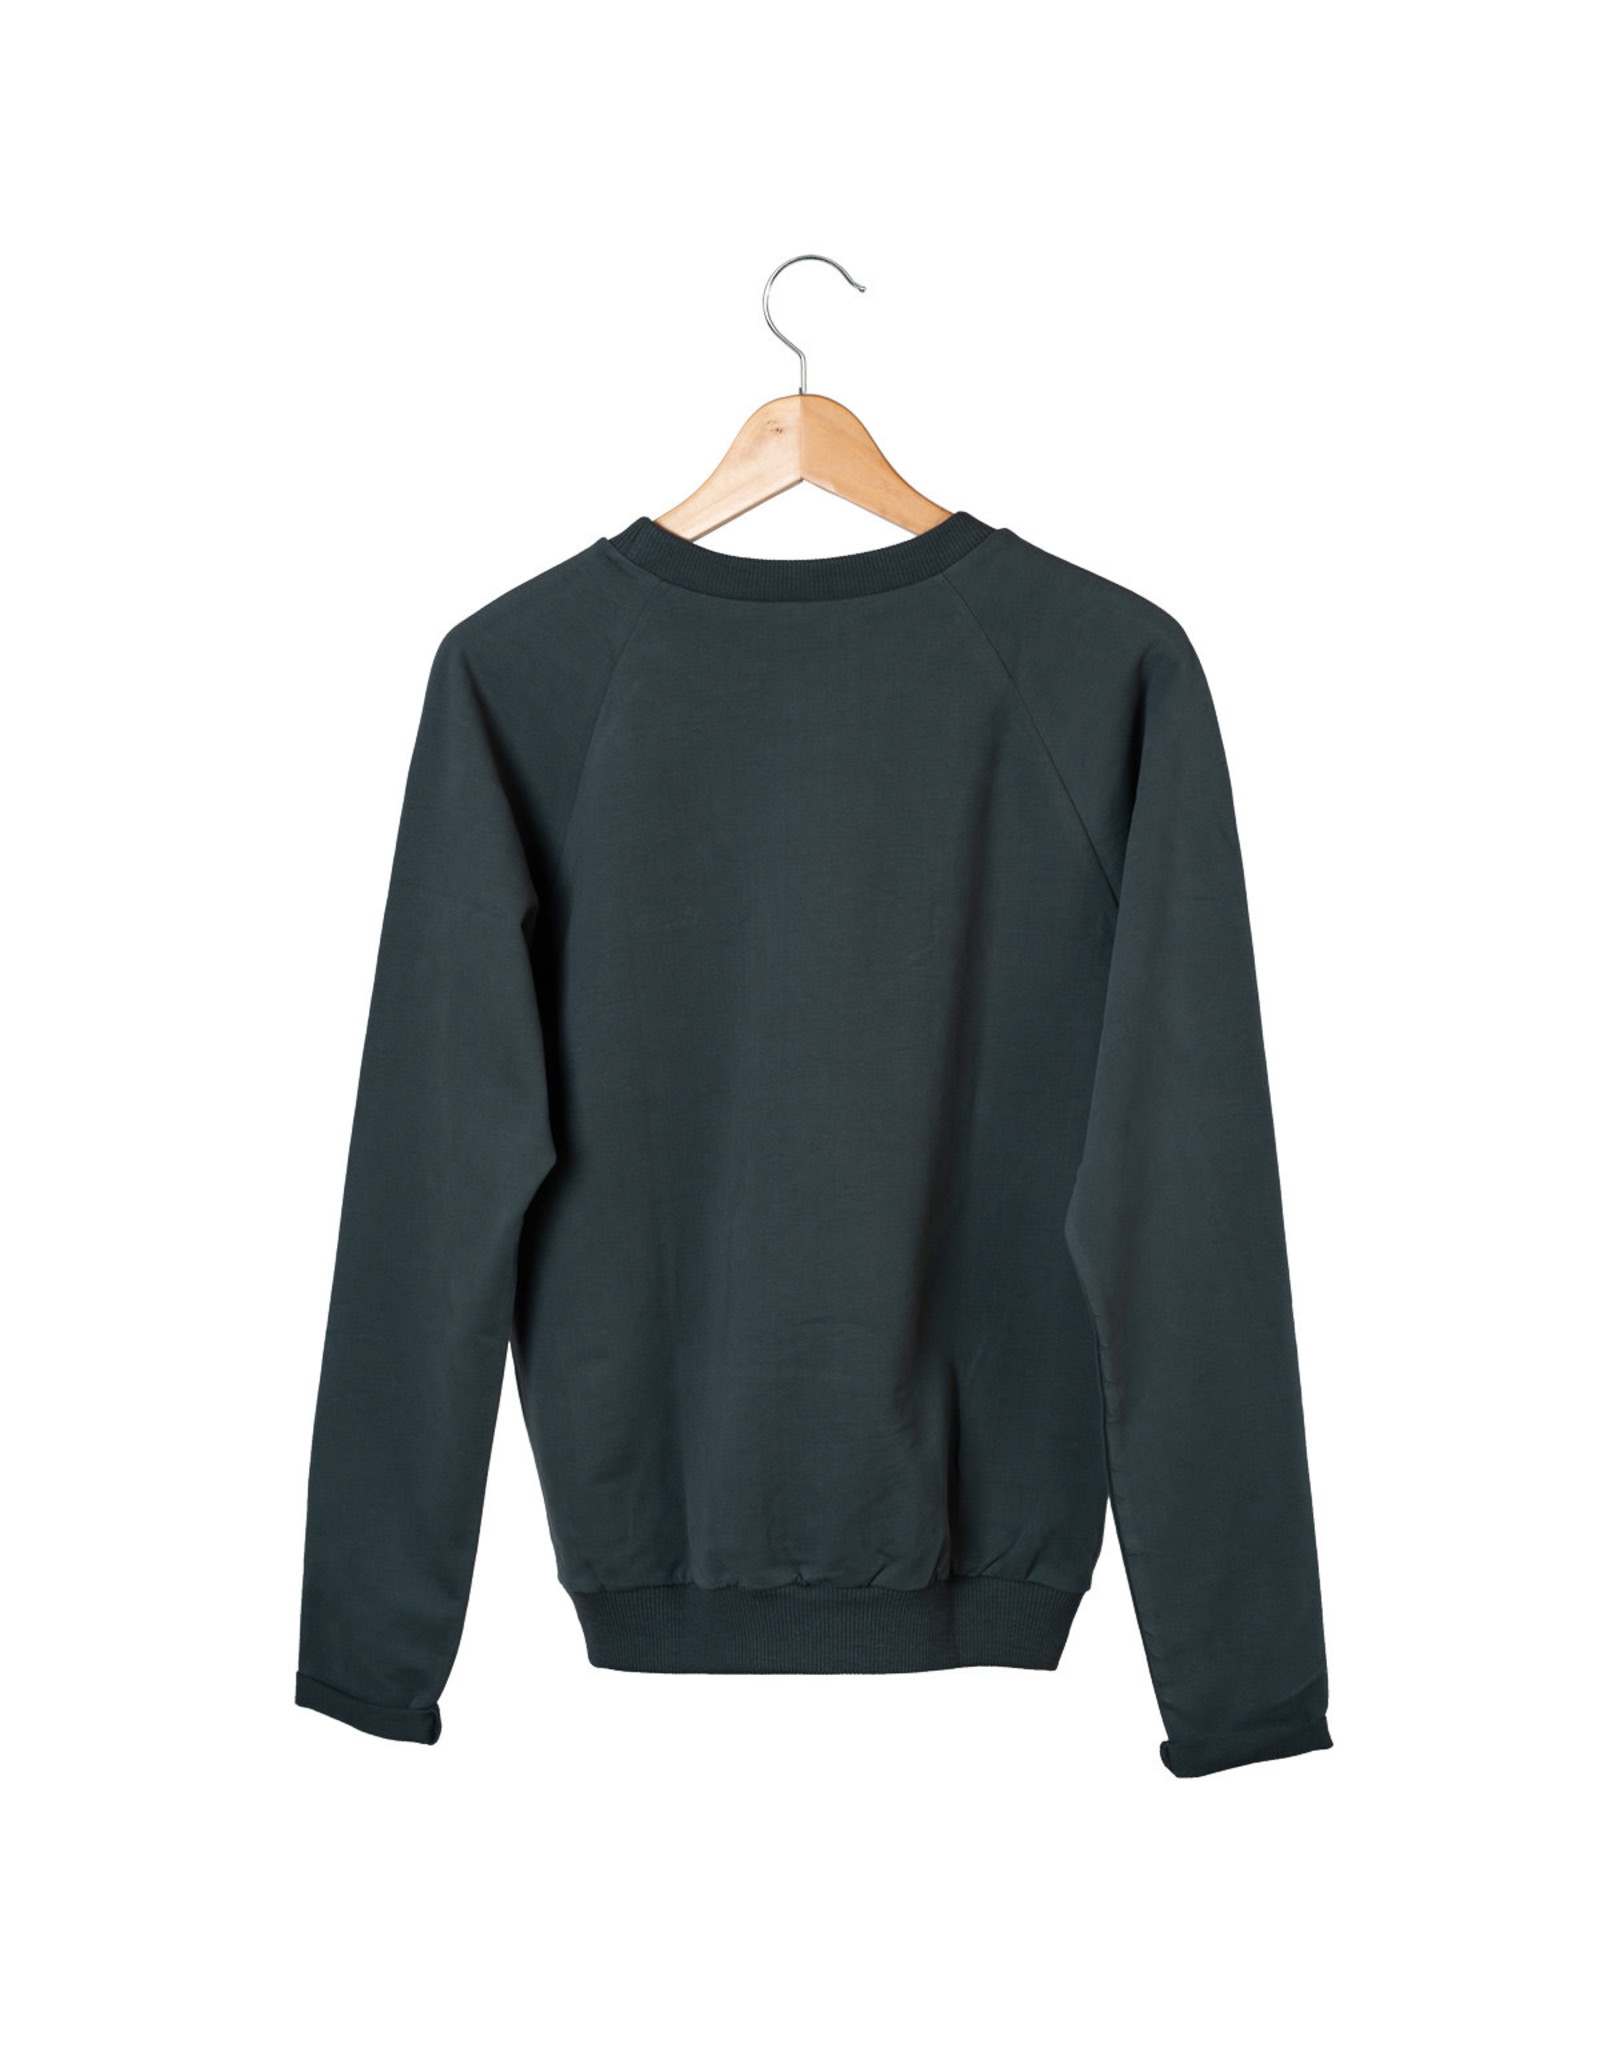 Waes Sweater Pirate Black